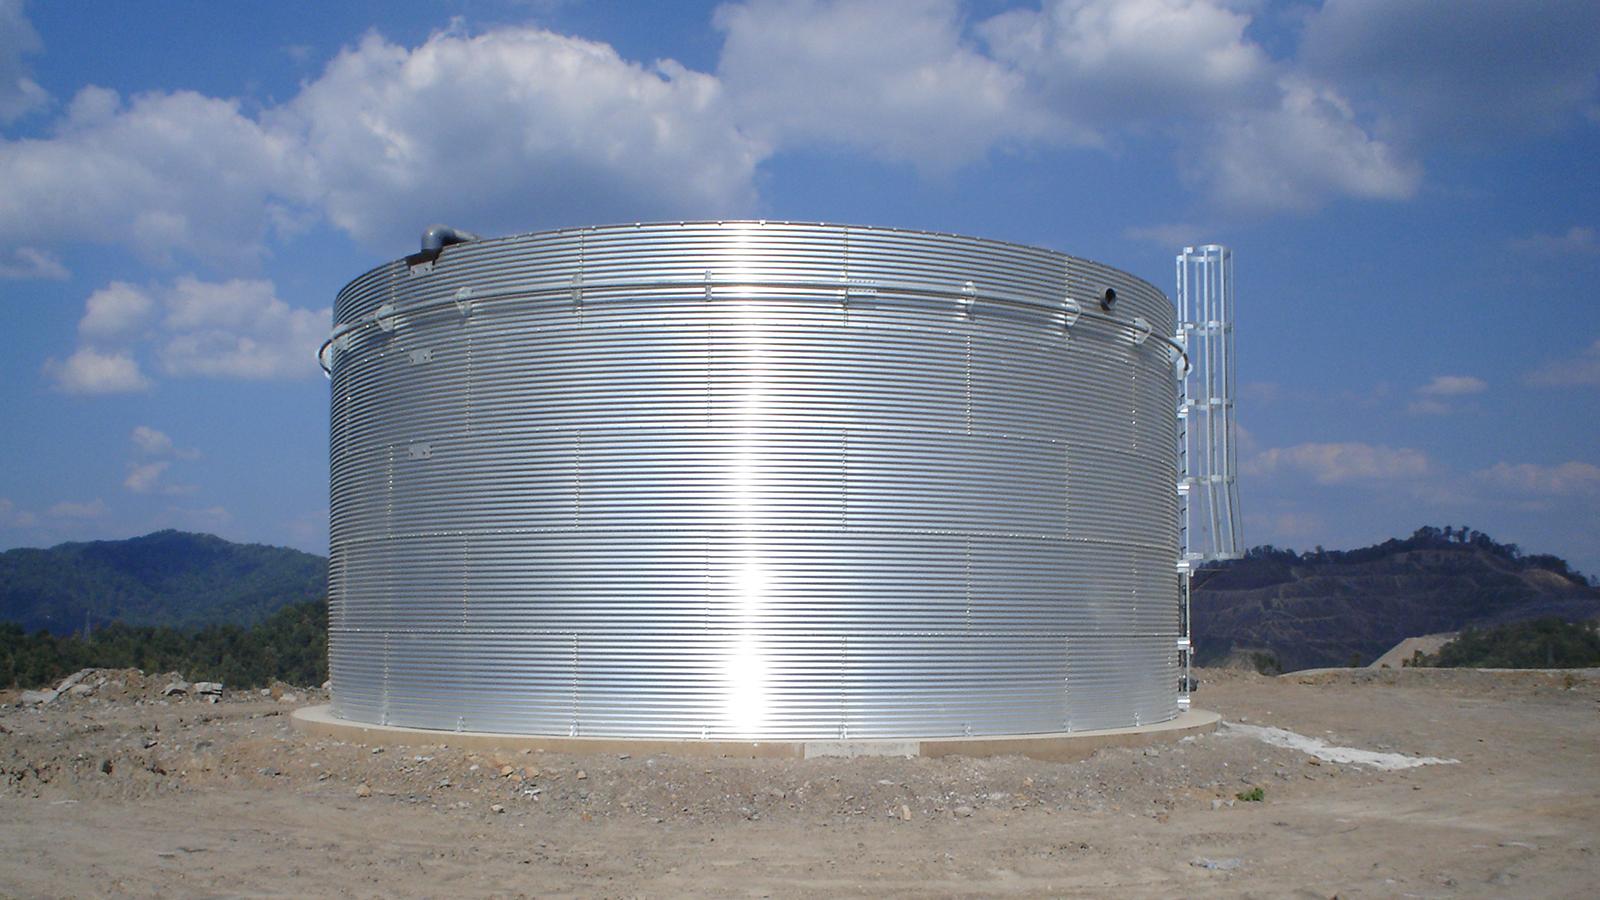 Mining Water Storage Tank Bluestone Mine CorGal-3905 & Mining Water Storage Tank Bluestone Mine CorGal-3905 u2013 Water Storage ...